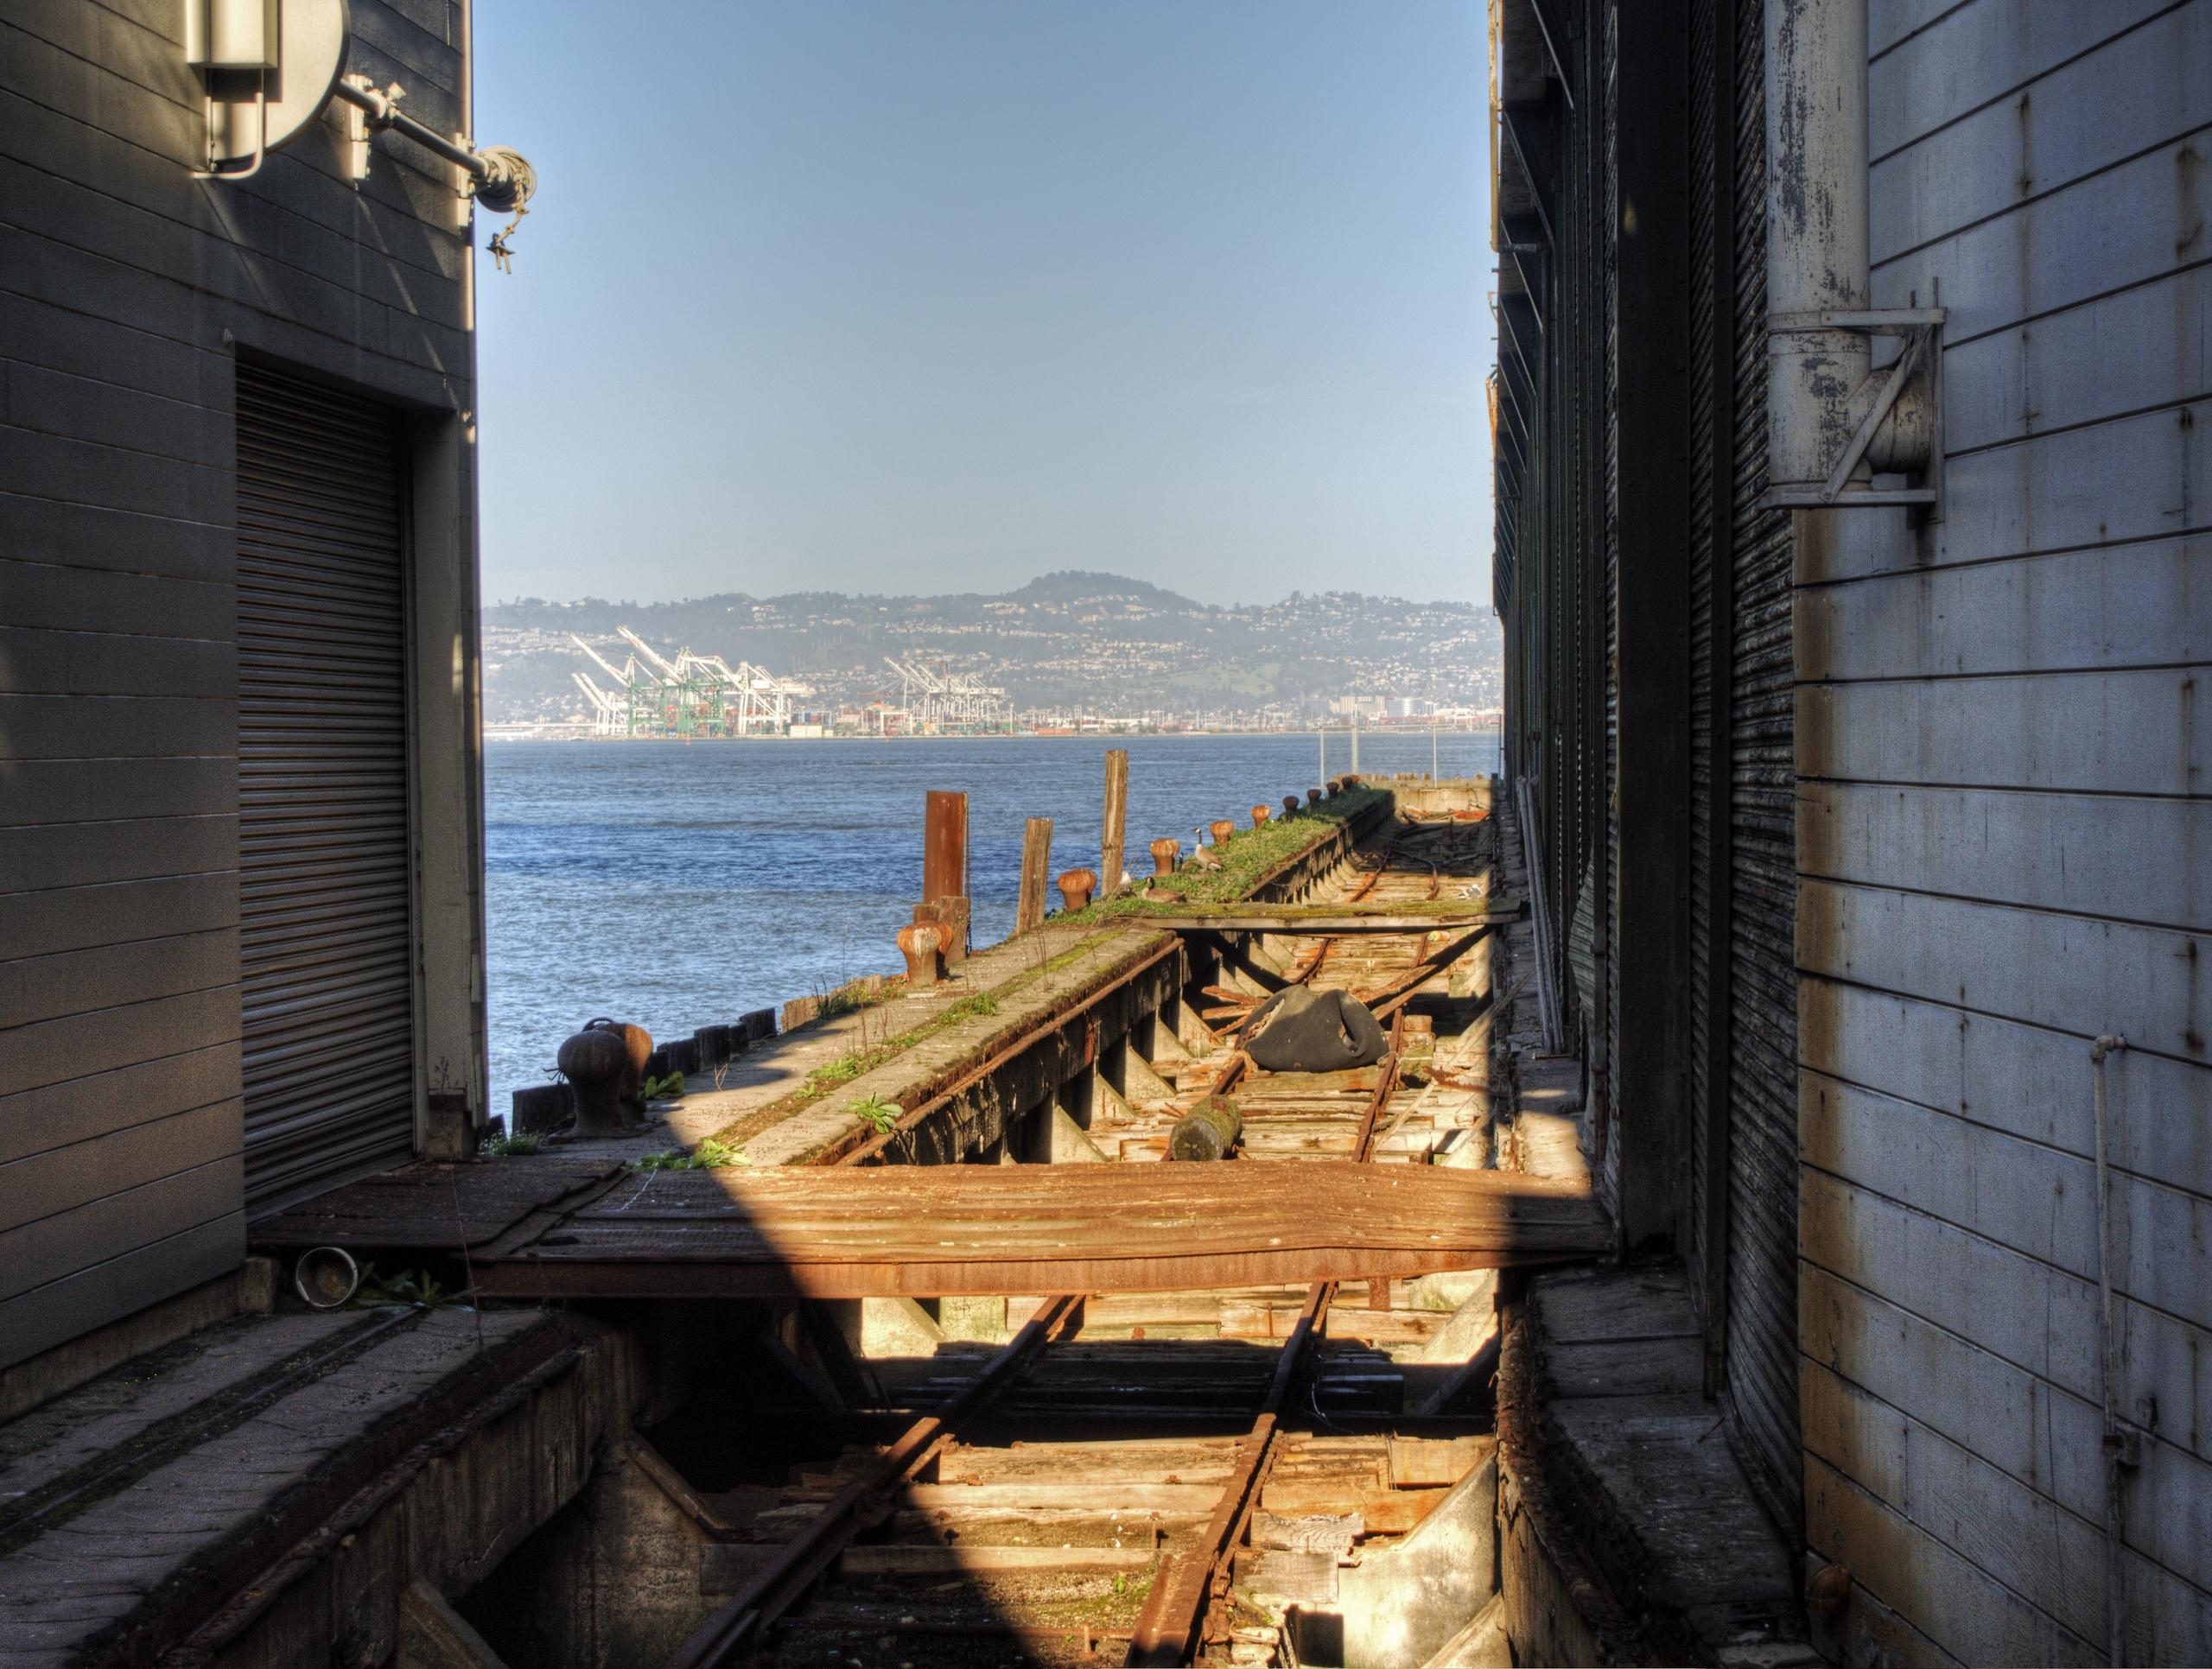 sanfran_pier_train.jpg